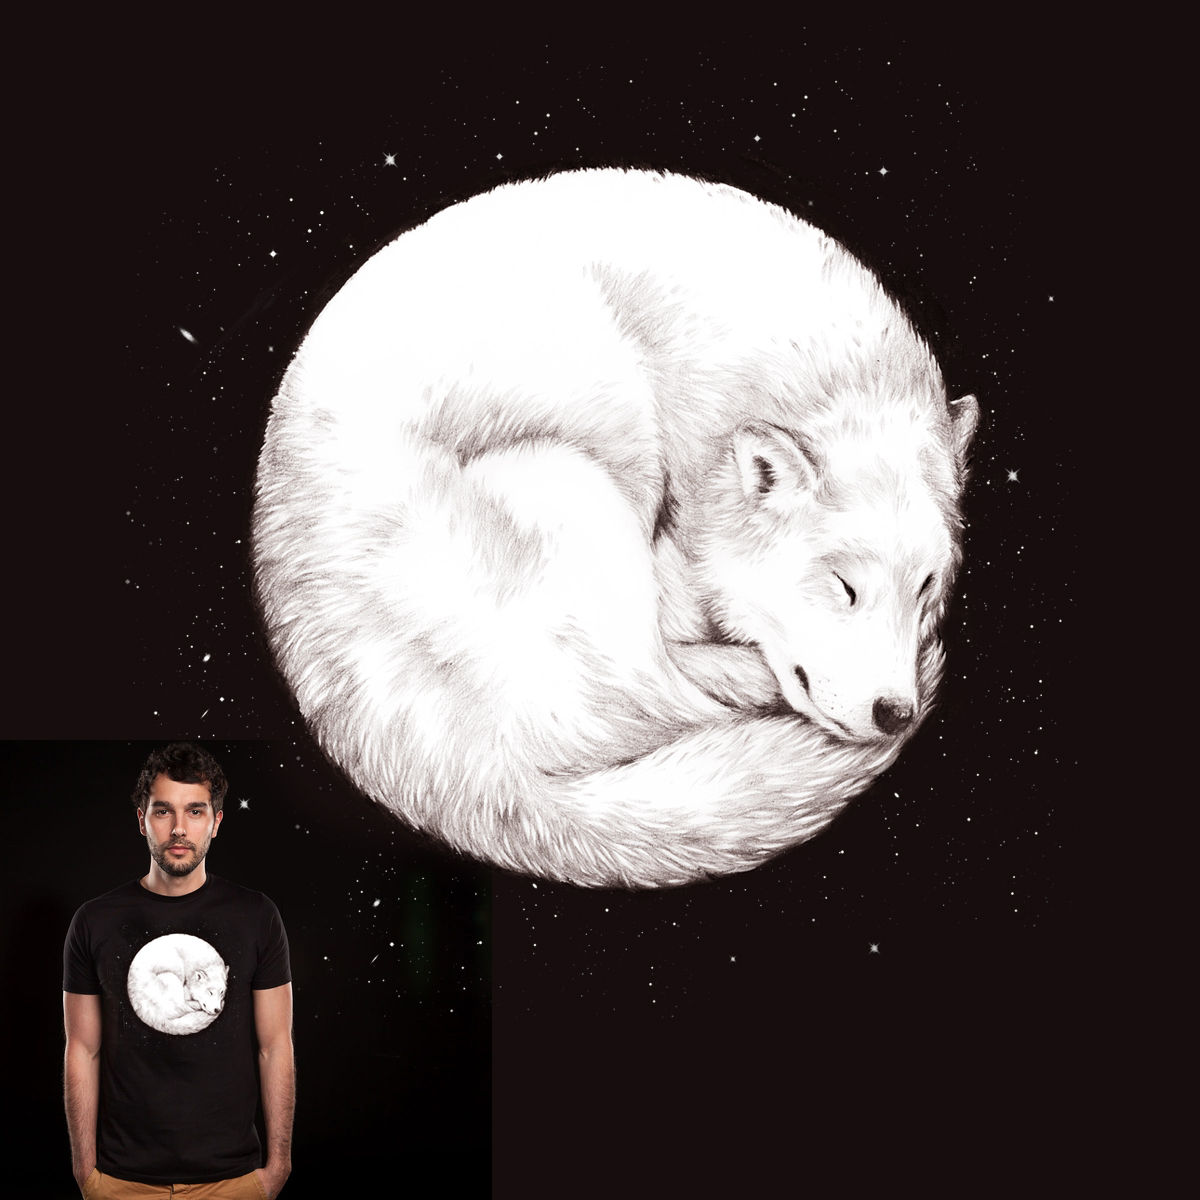 The howl of the moon by DanielTeixeira on Threadless